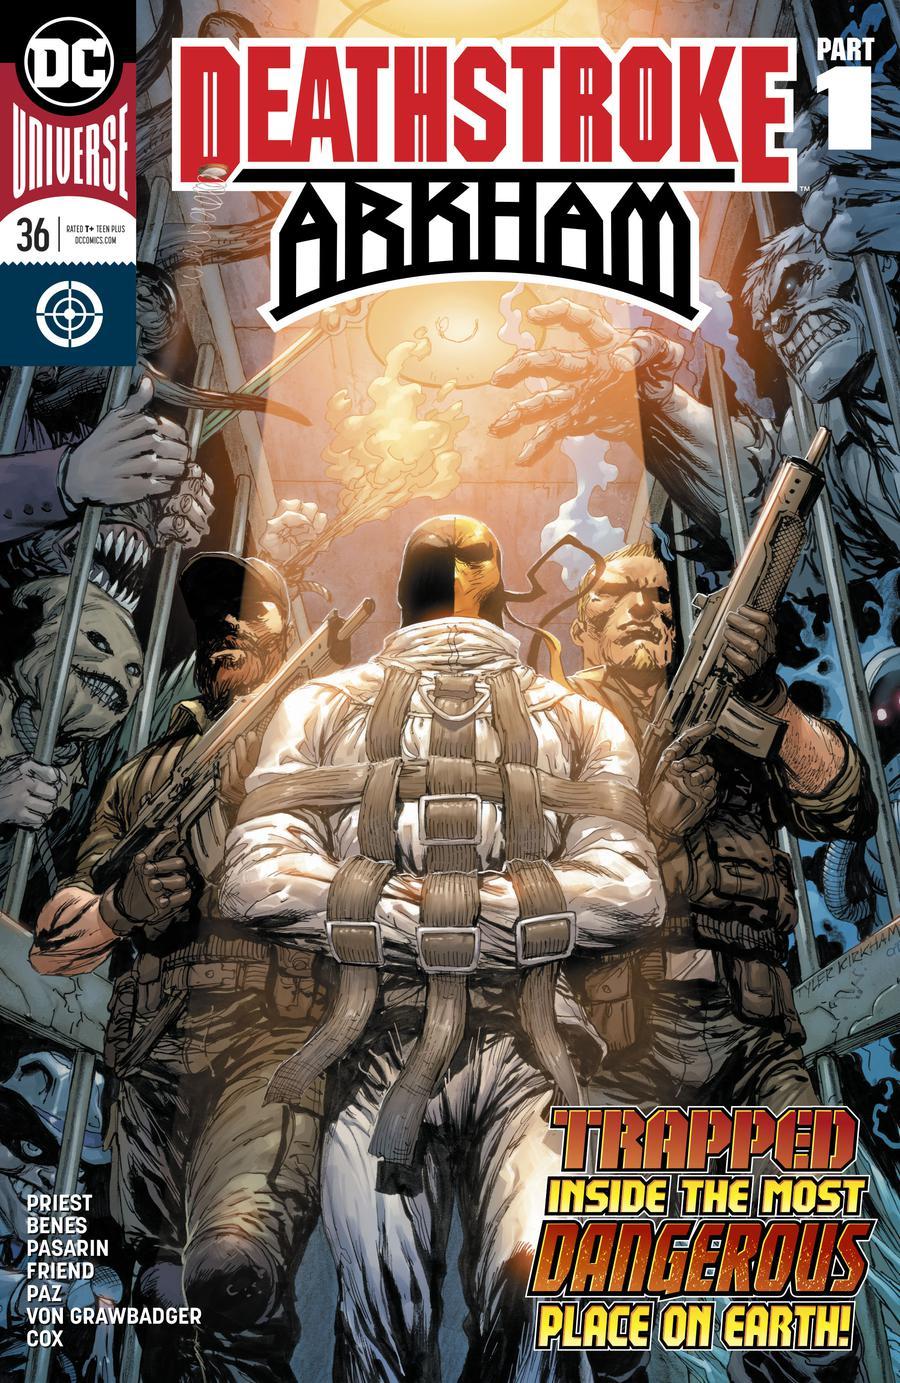 Deathstroke Vol 4 #36 Cover A Regular Tyler Kirkham Cover